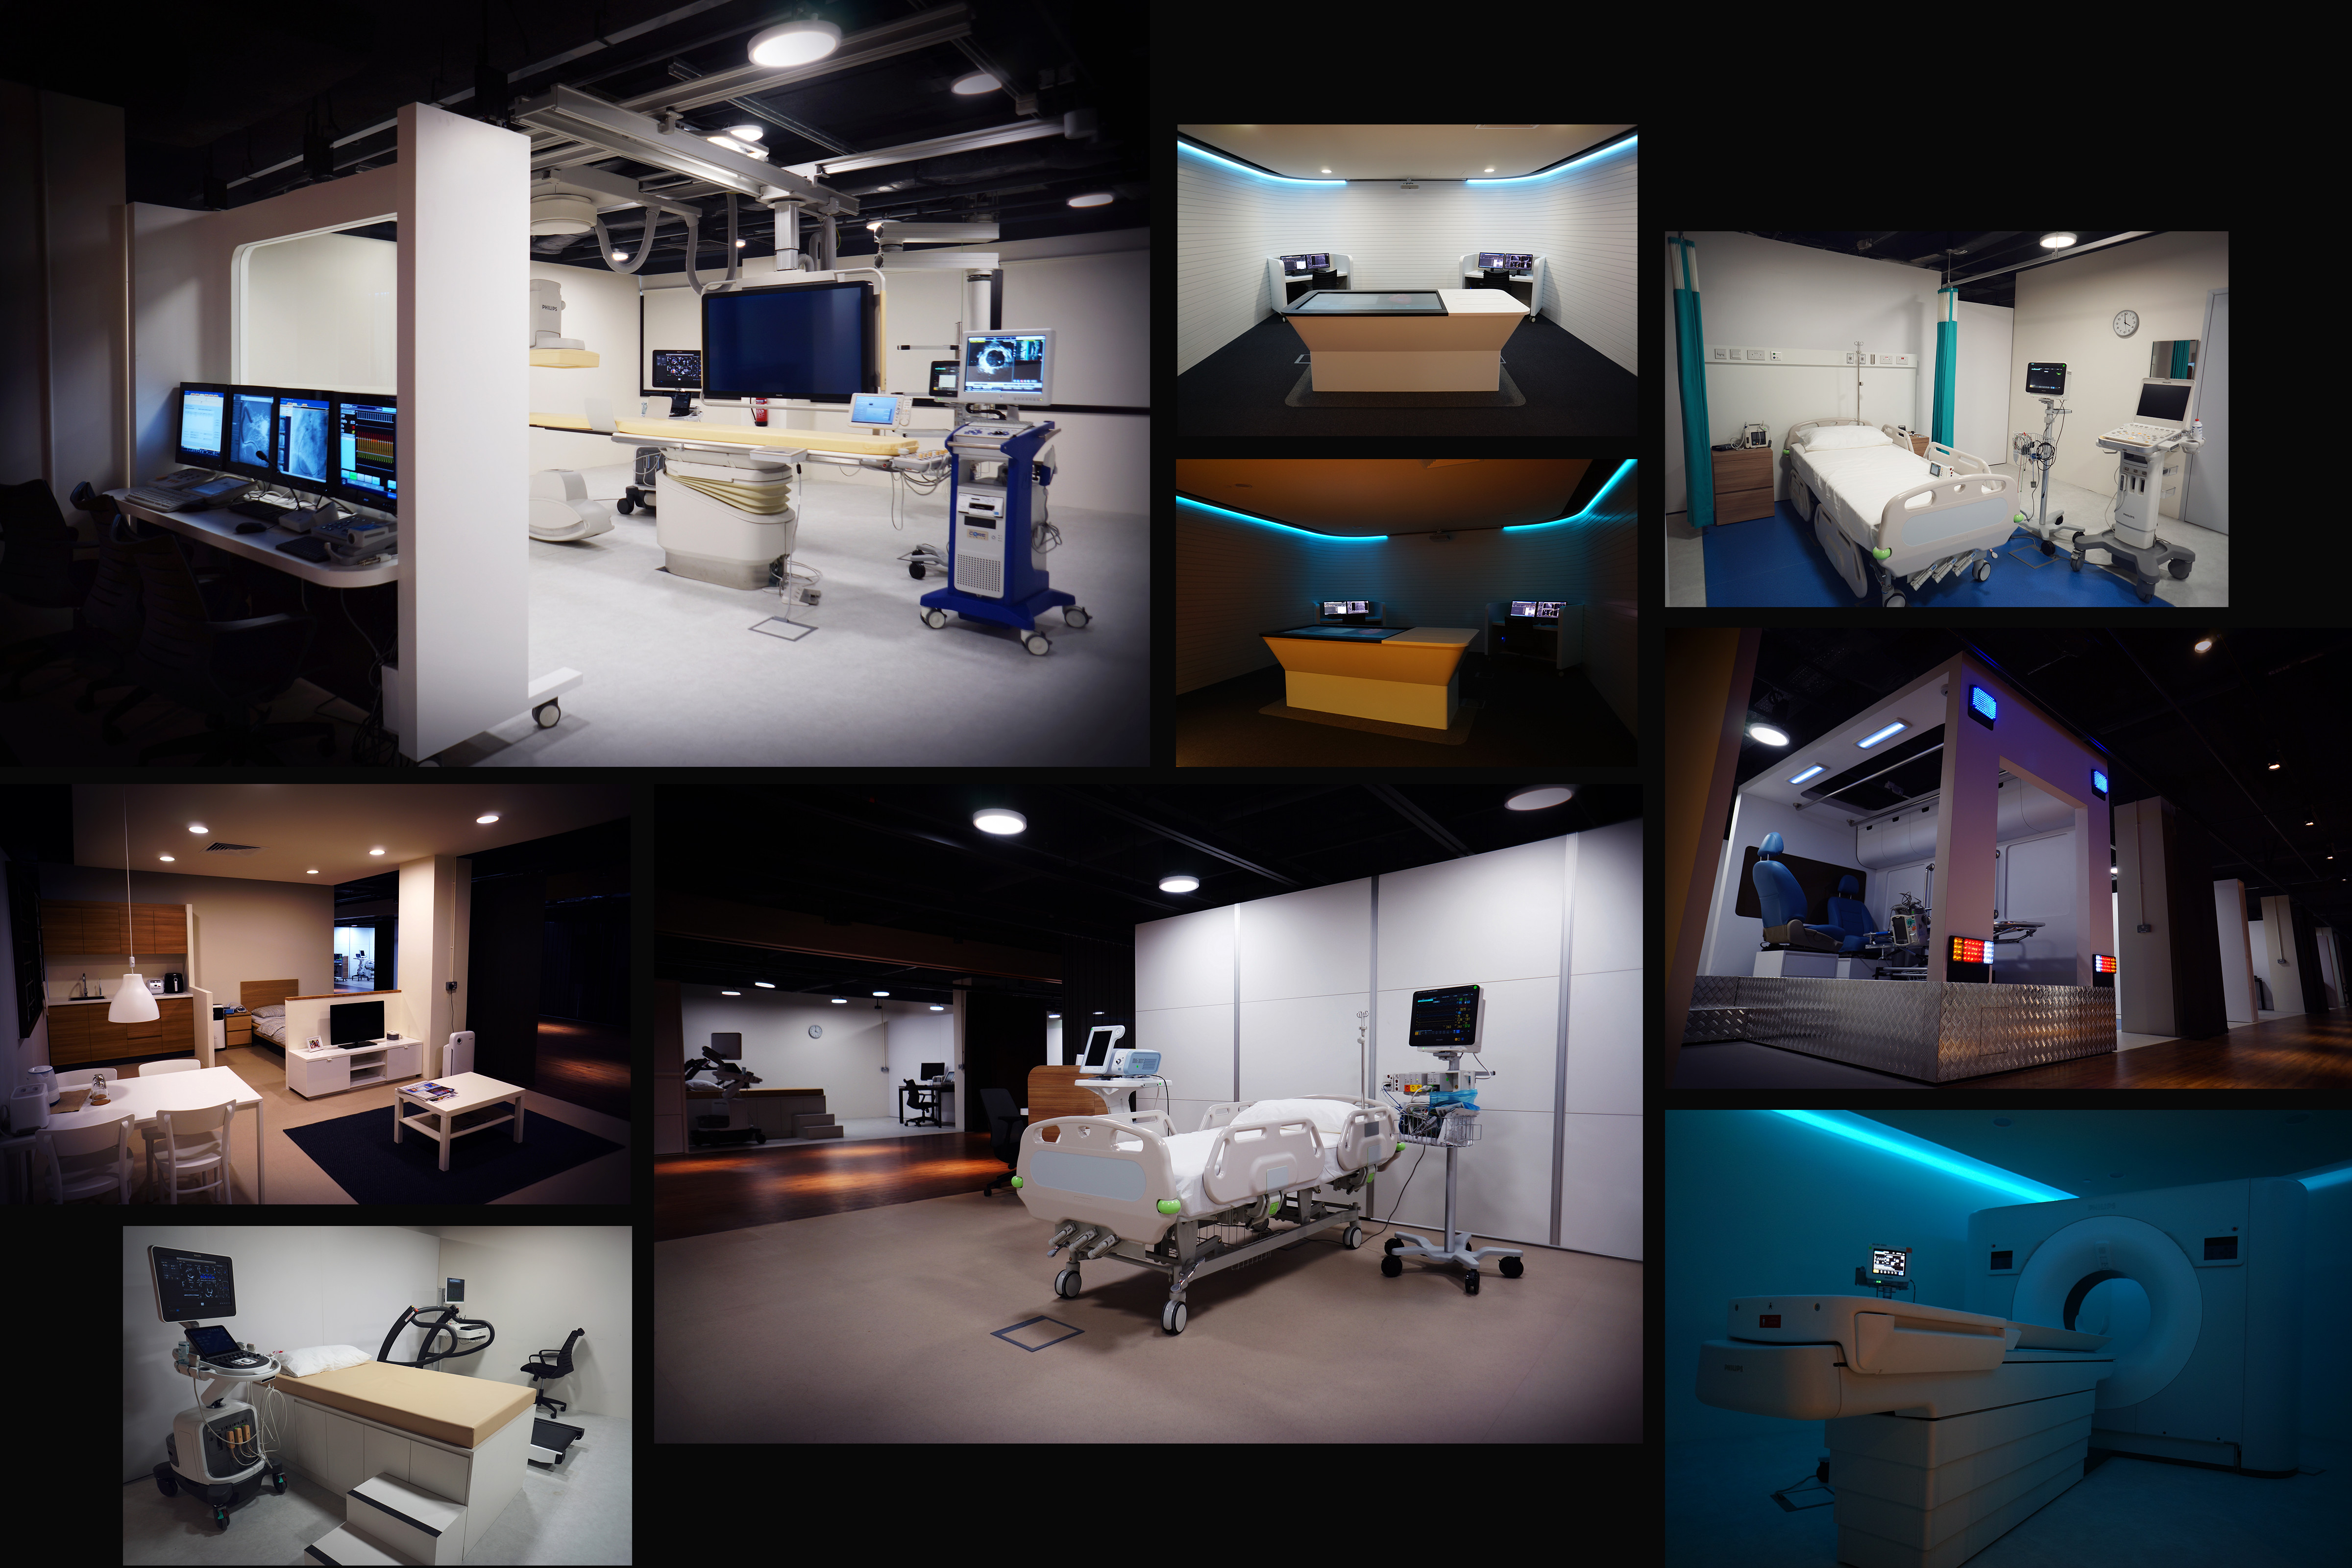 Health Continuum Space (Innovation Facility)